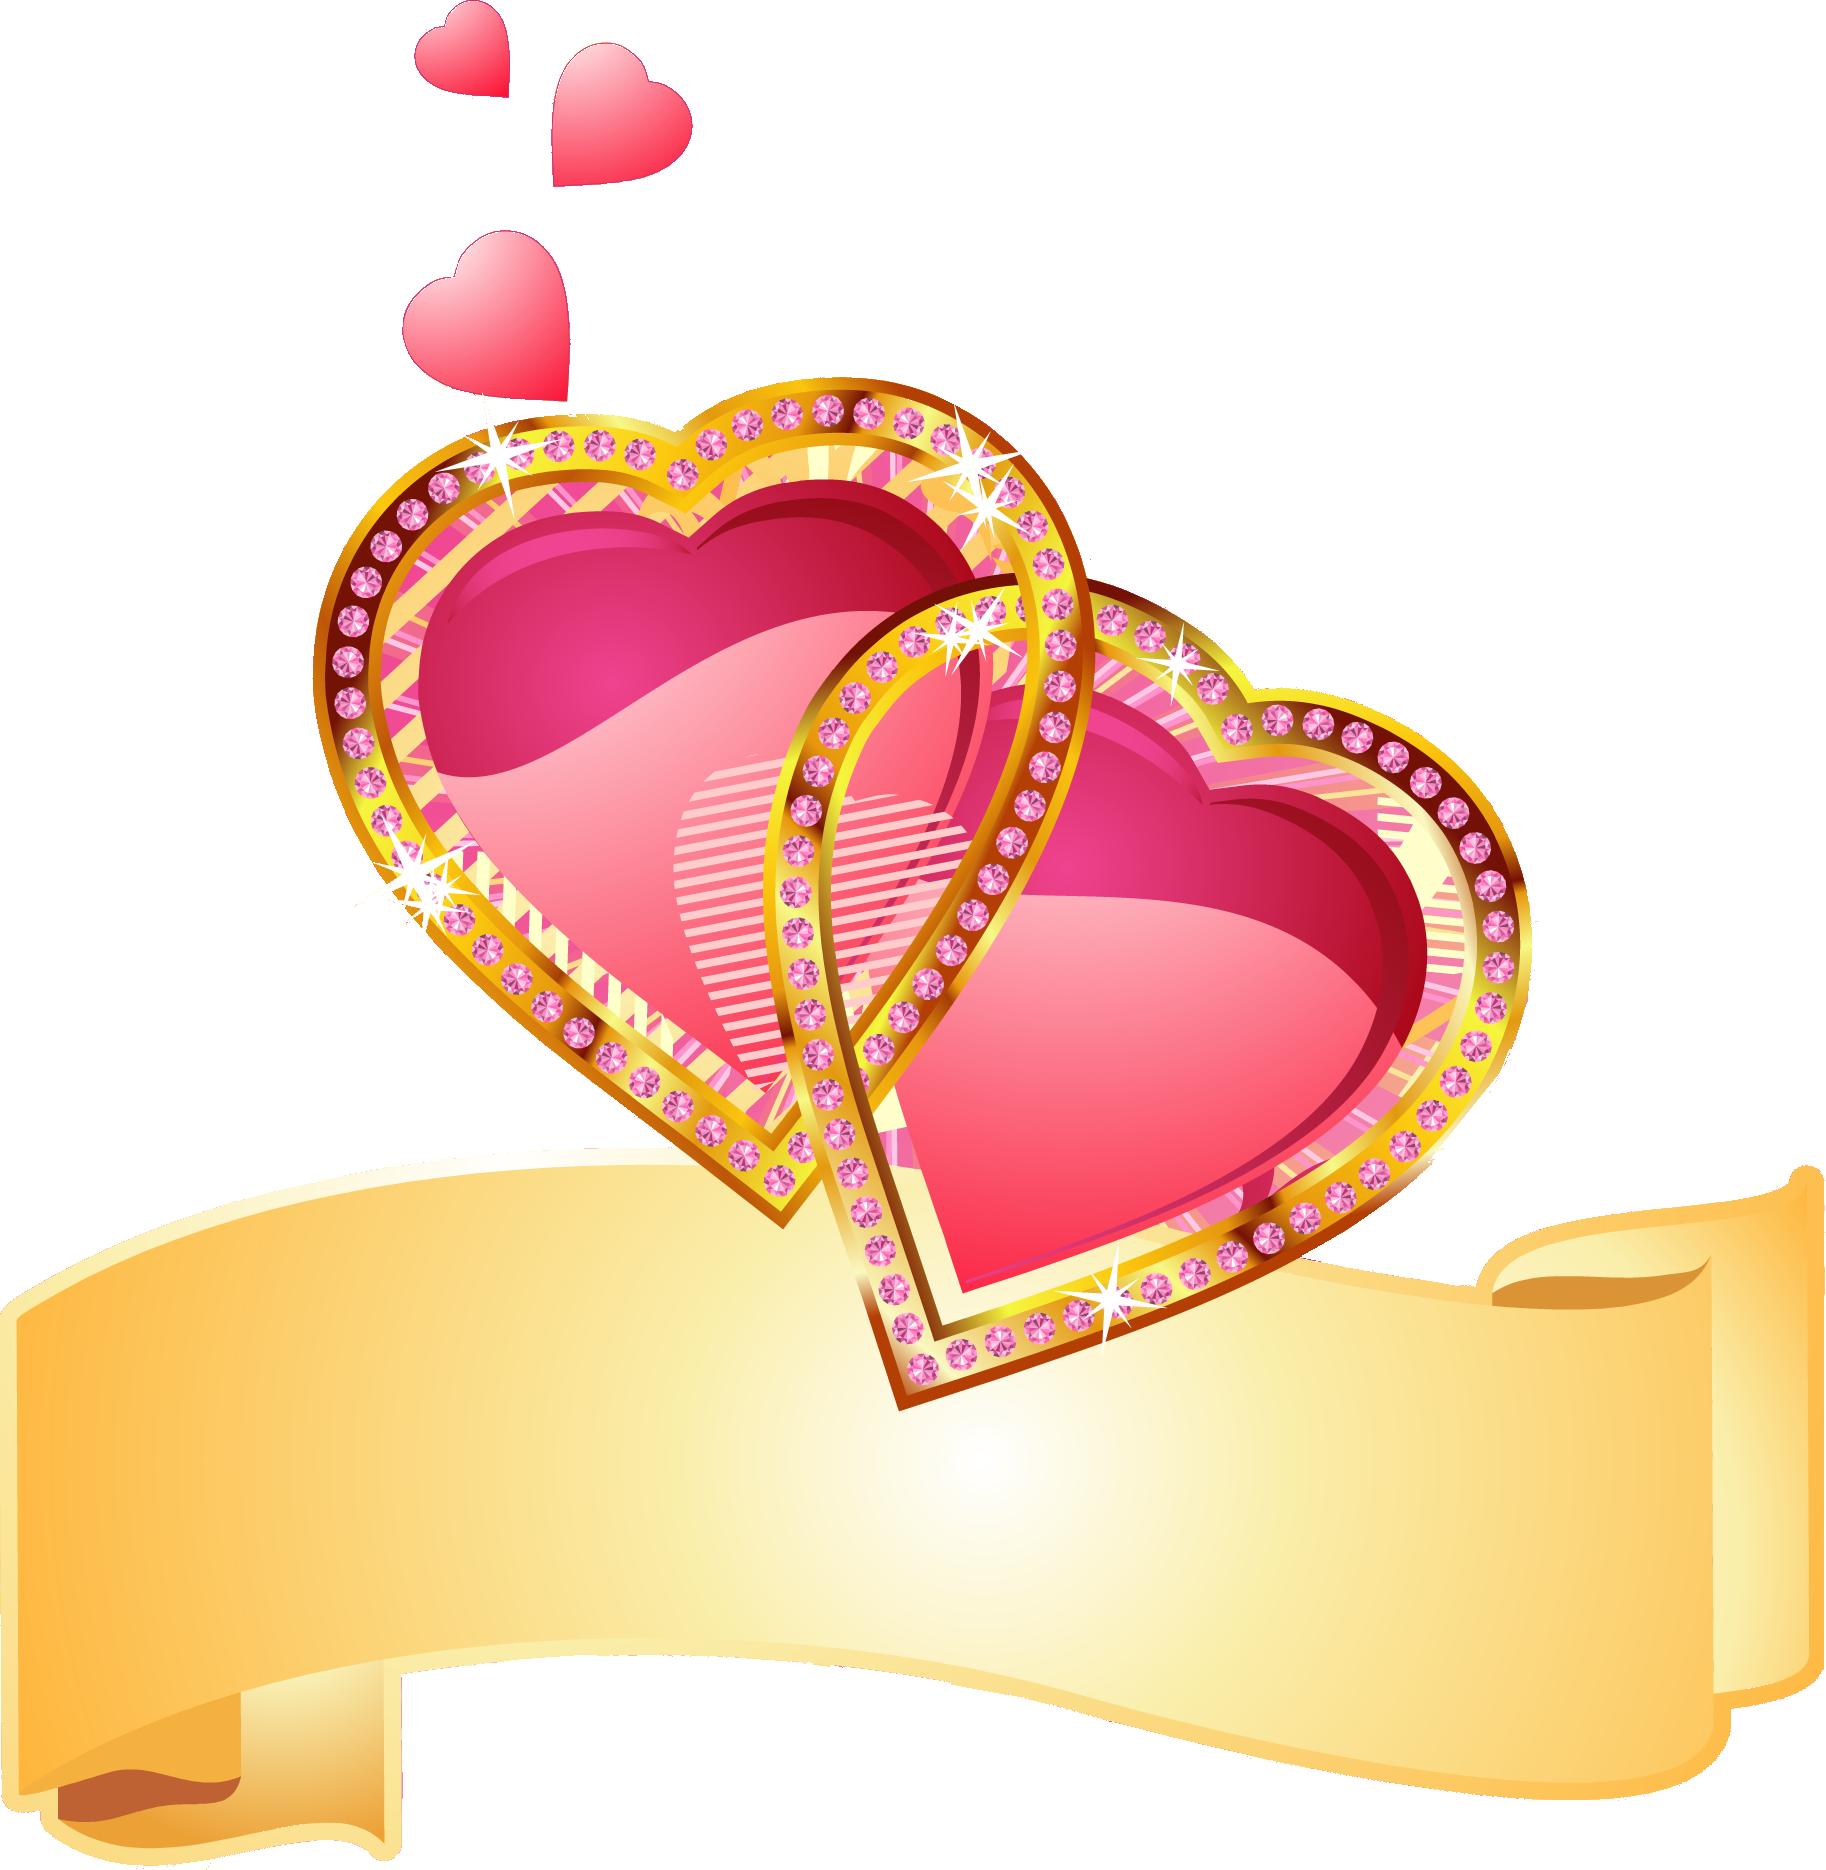 картинки кольца и сердечки развитого кустарникового